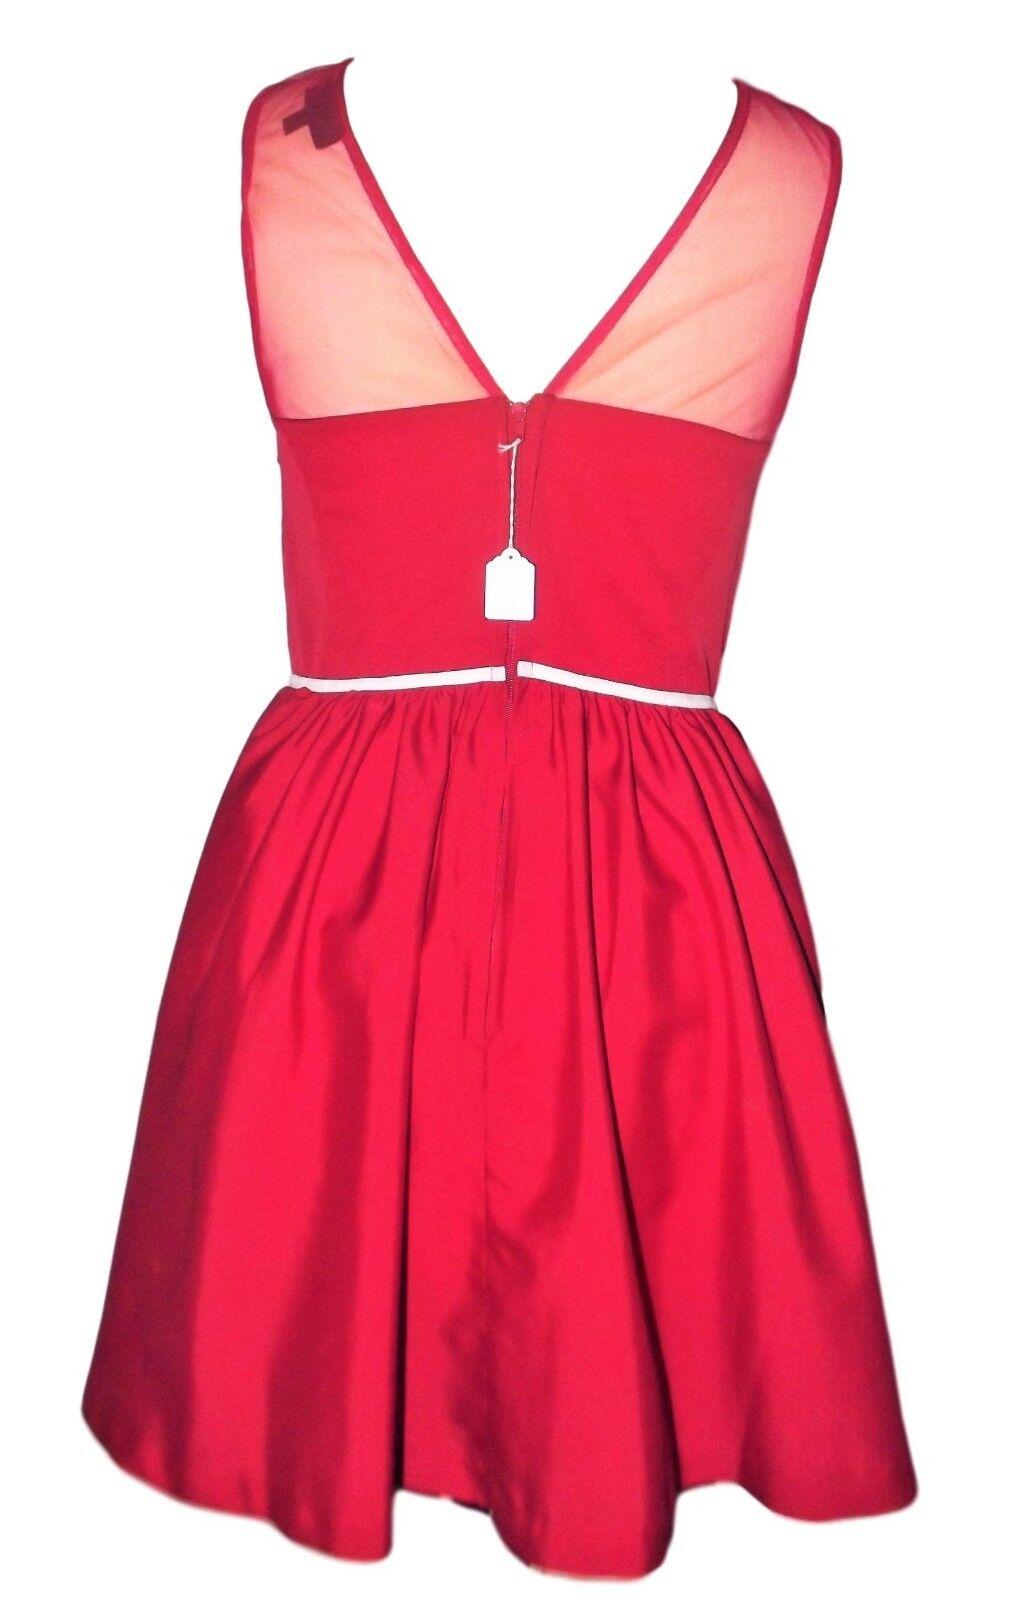 TOPSHOP TOPSHOP TOPSHOP CARLY RAE JEPSEN ROBE DRESS VALENTINE COLLECTOR DEGRIFFEE  TOU 42 cb2923